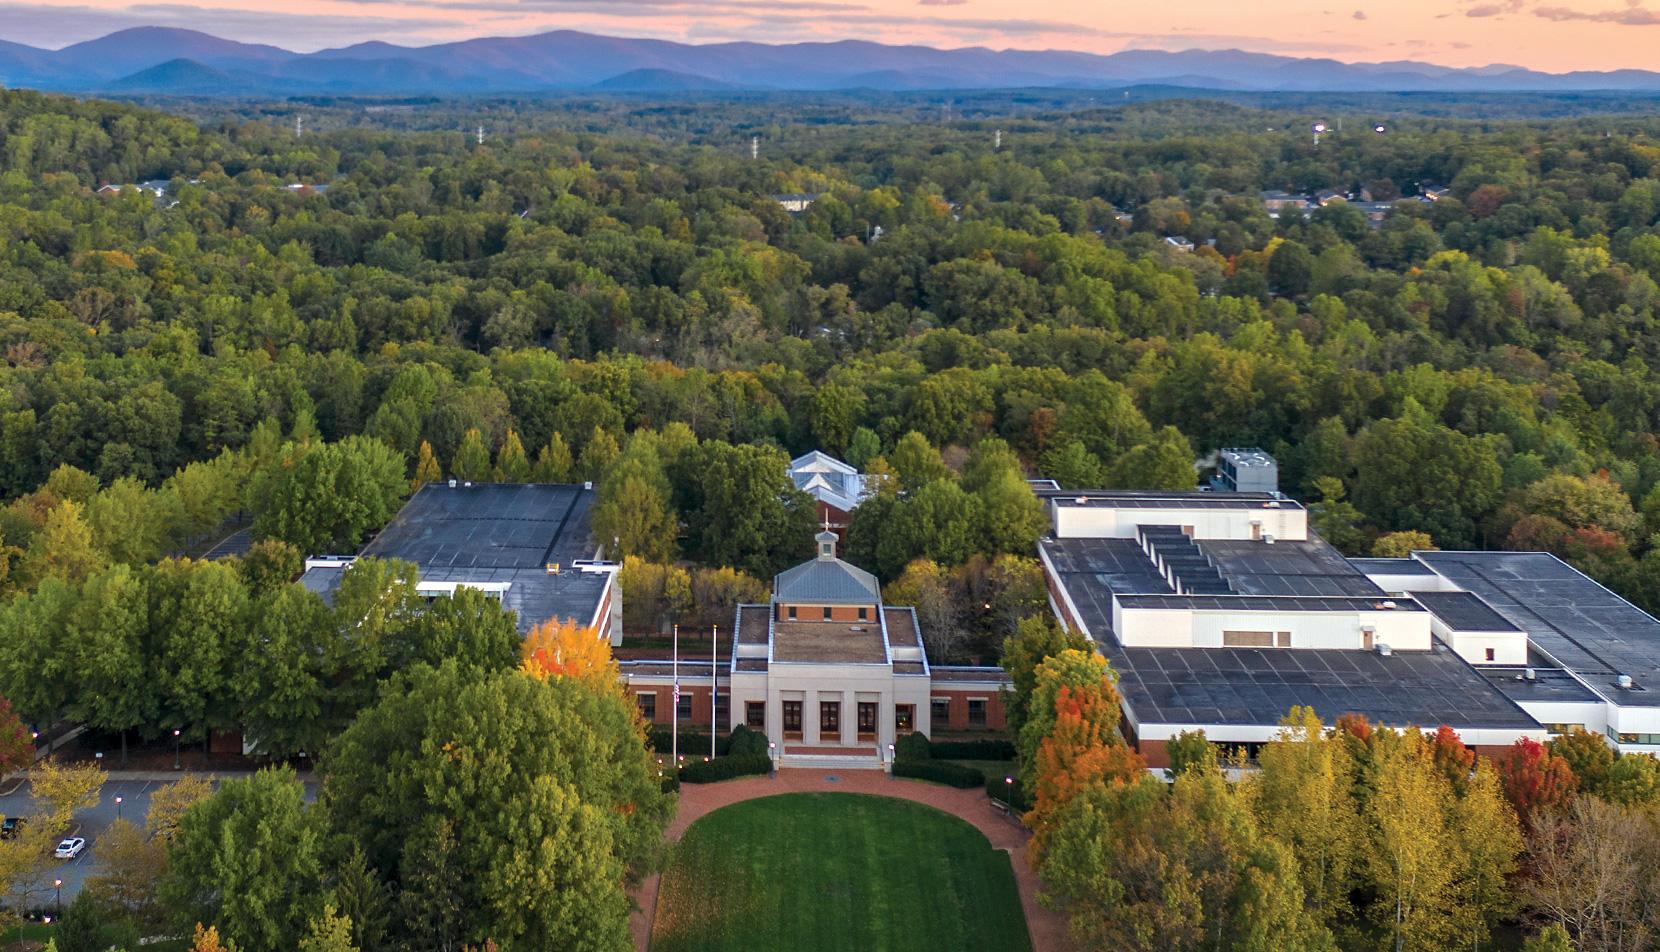 UVA Law School